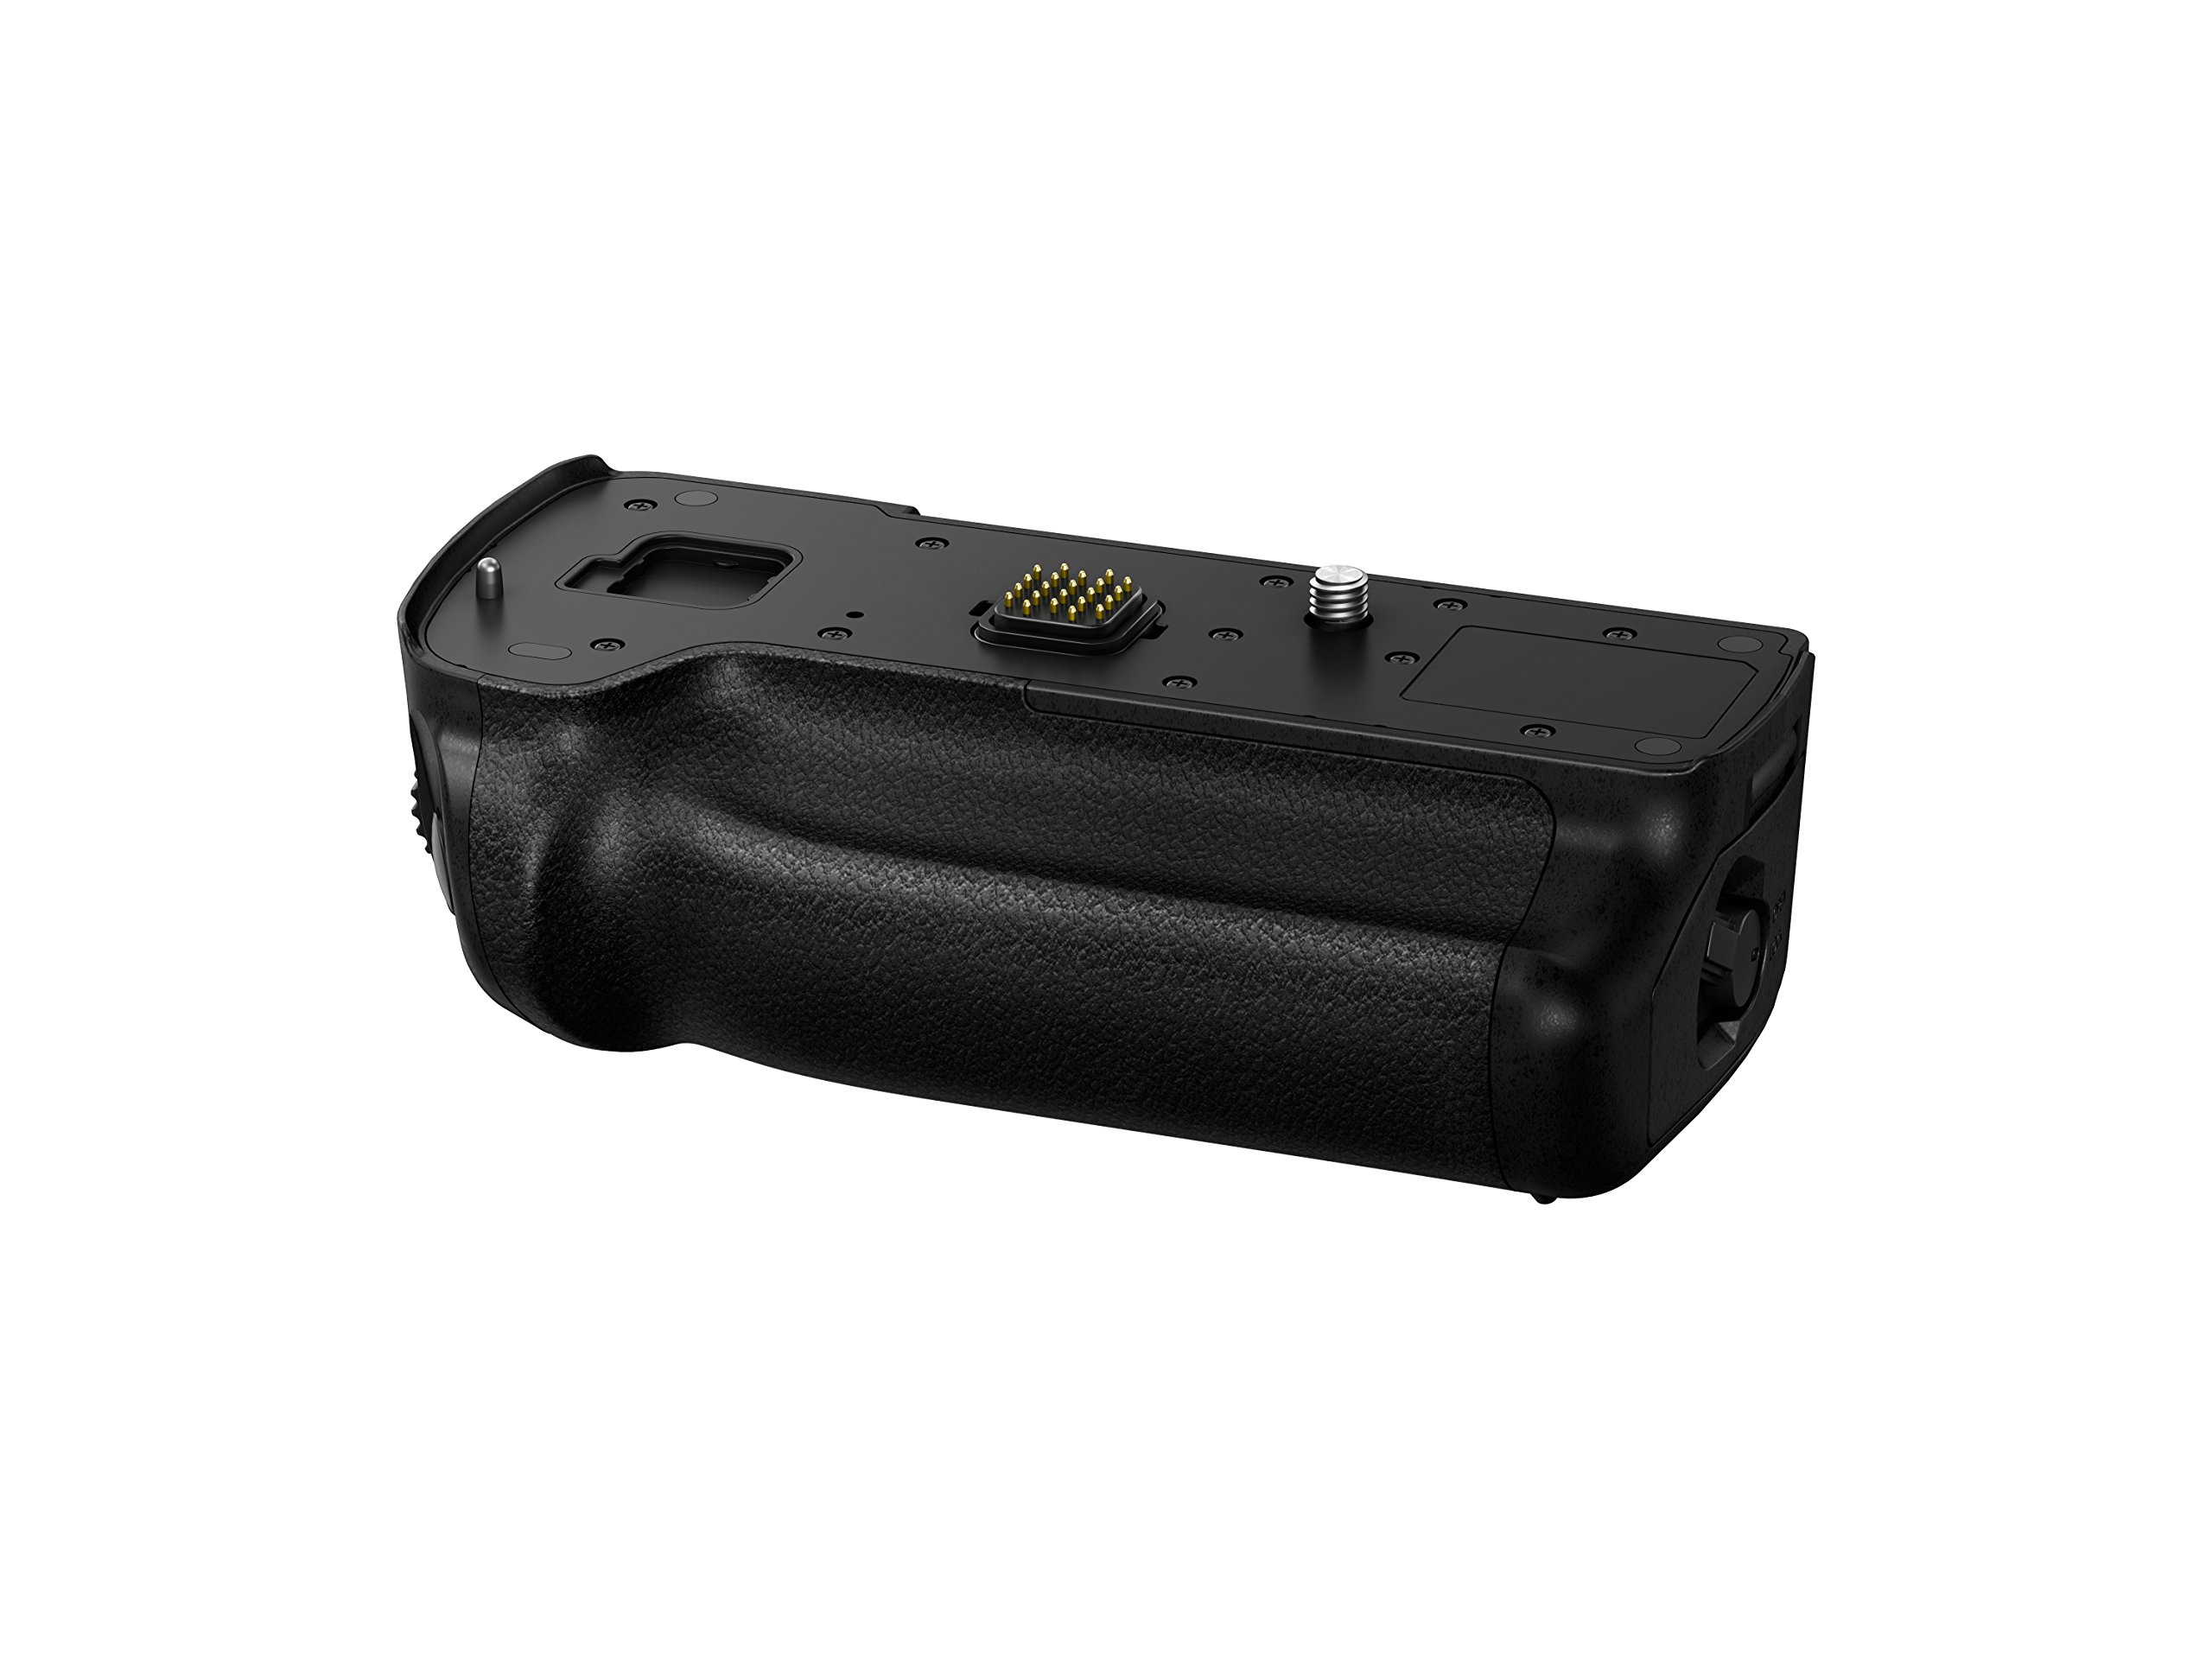 Panasonic LUMIX GH5 Battery Grip, Black (DMW-BGGH5) by Panasonic